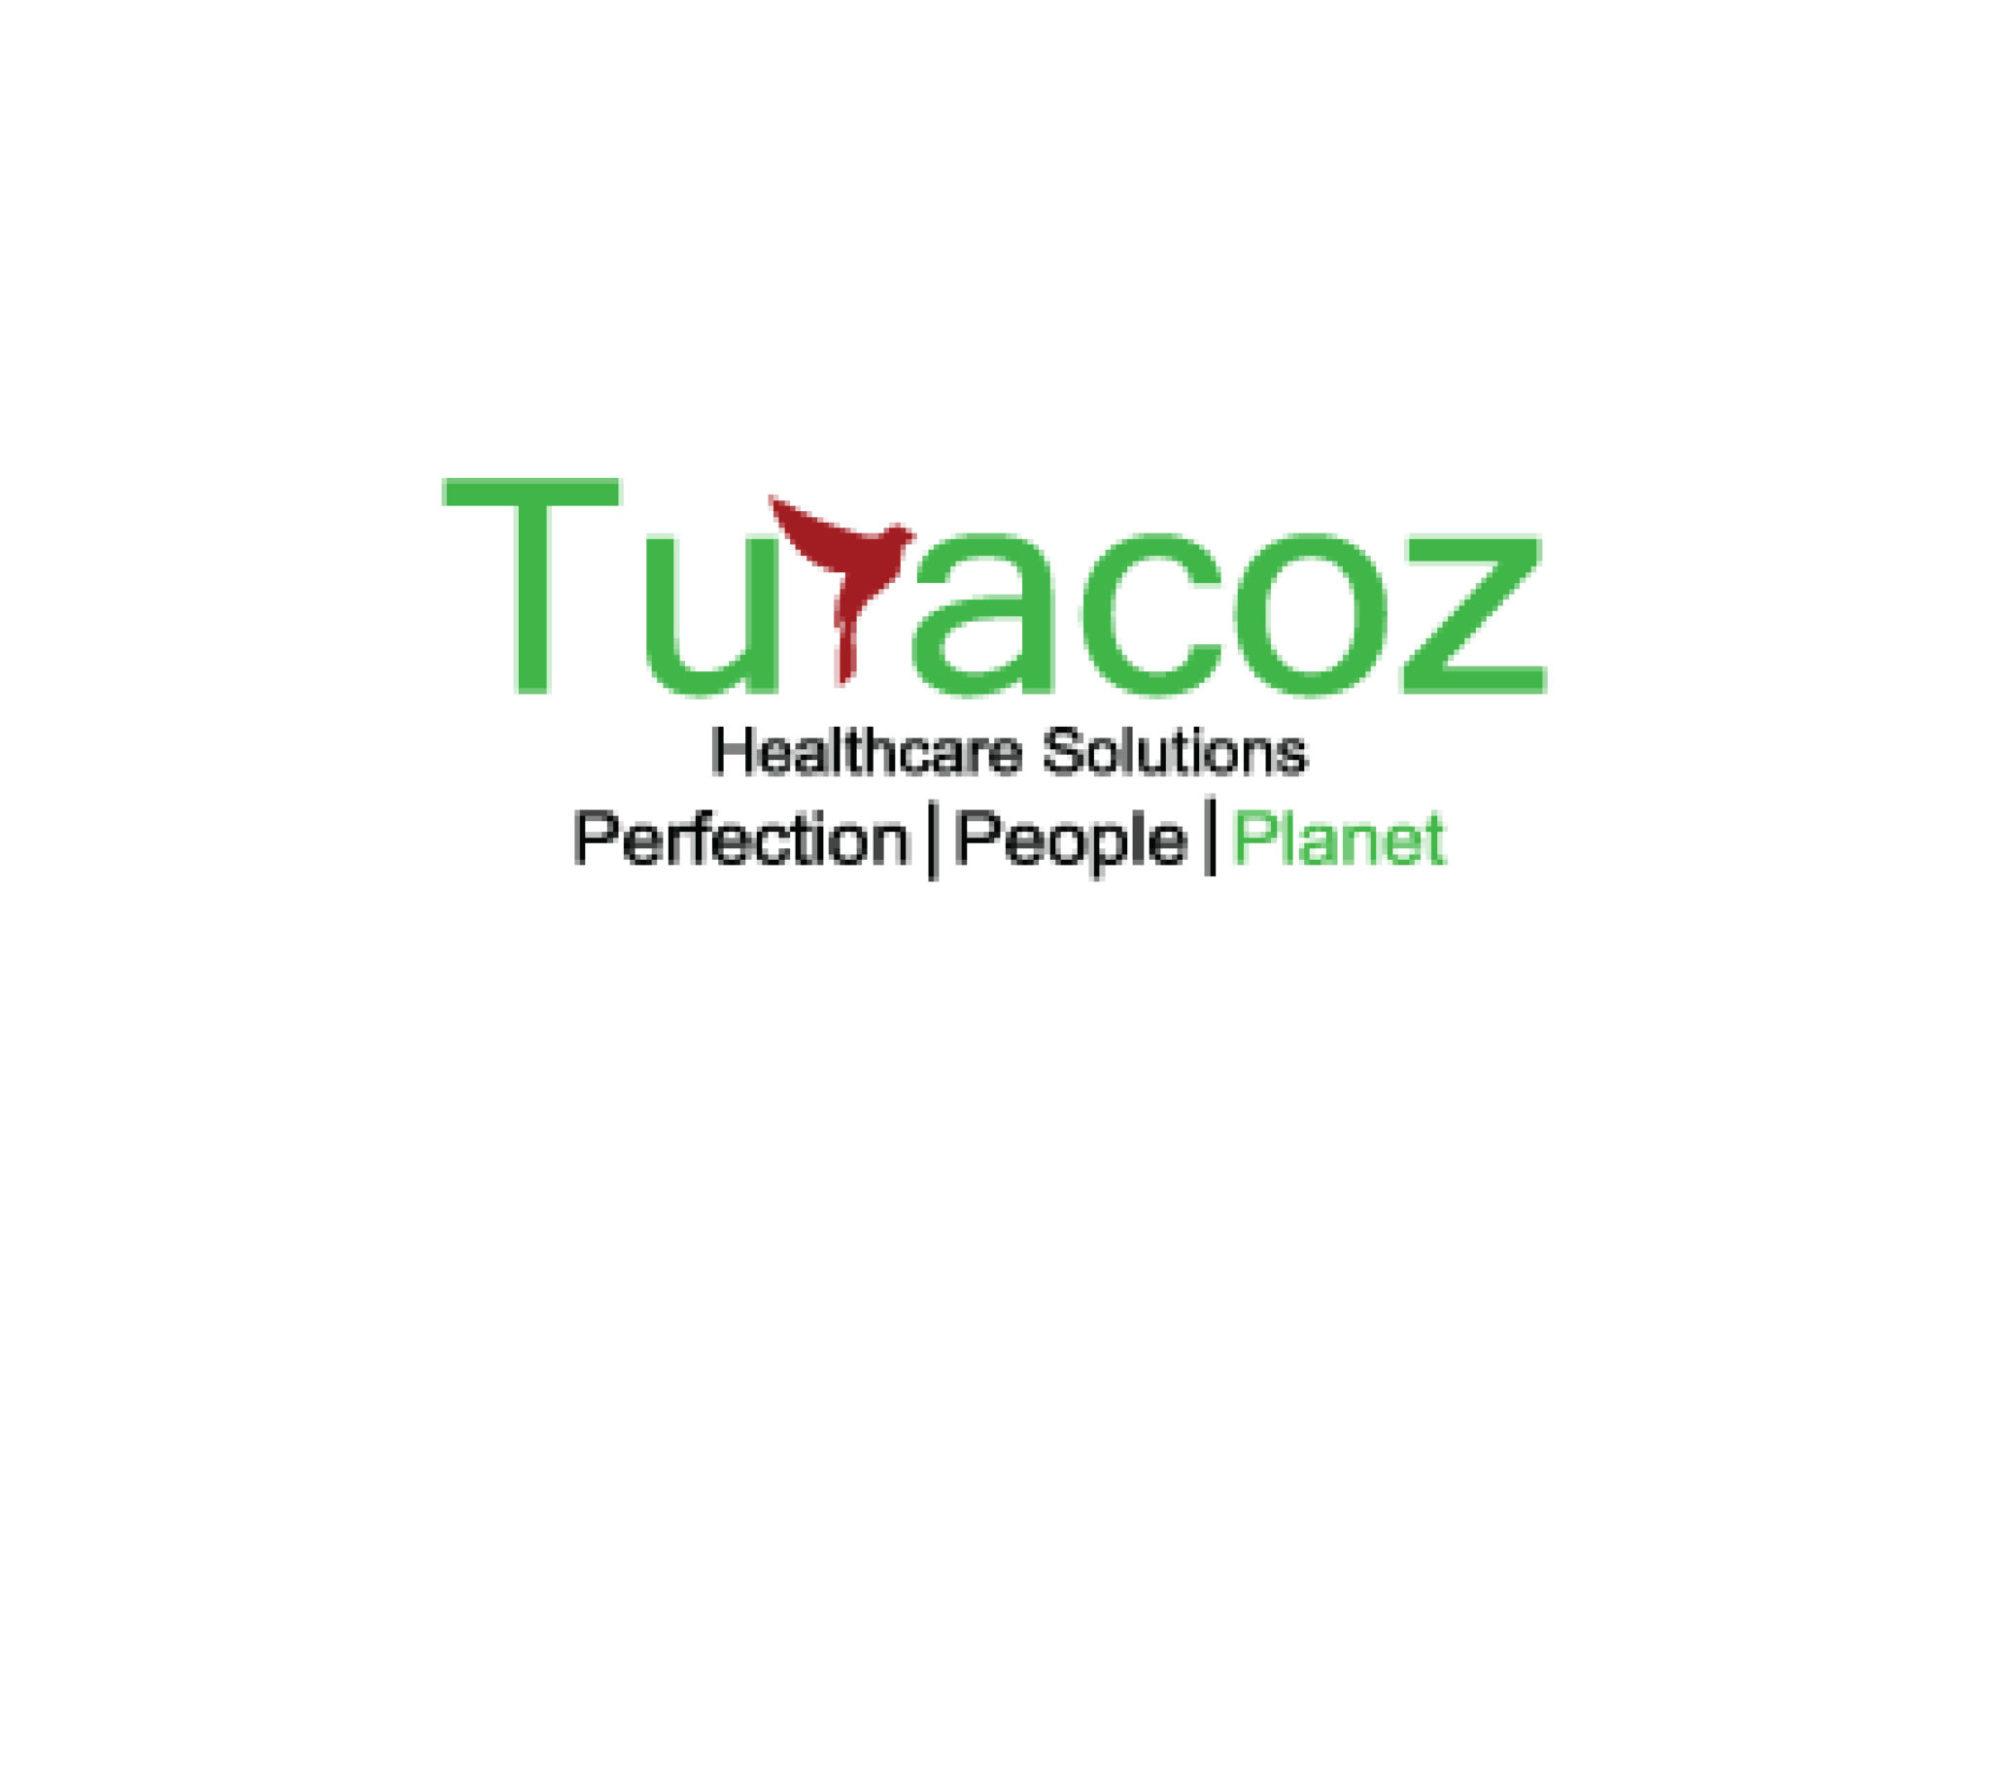 Turacoz